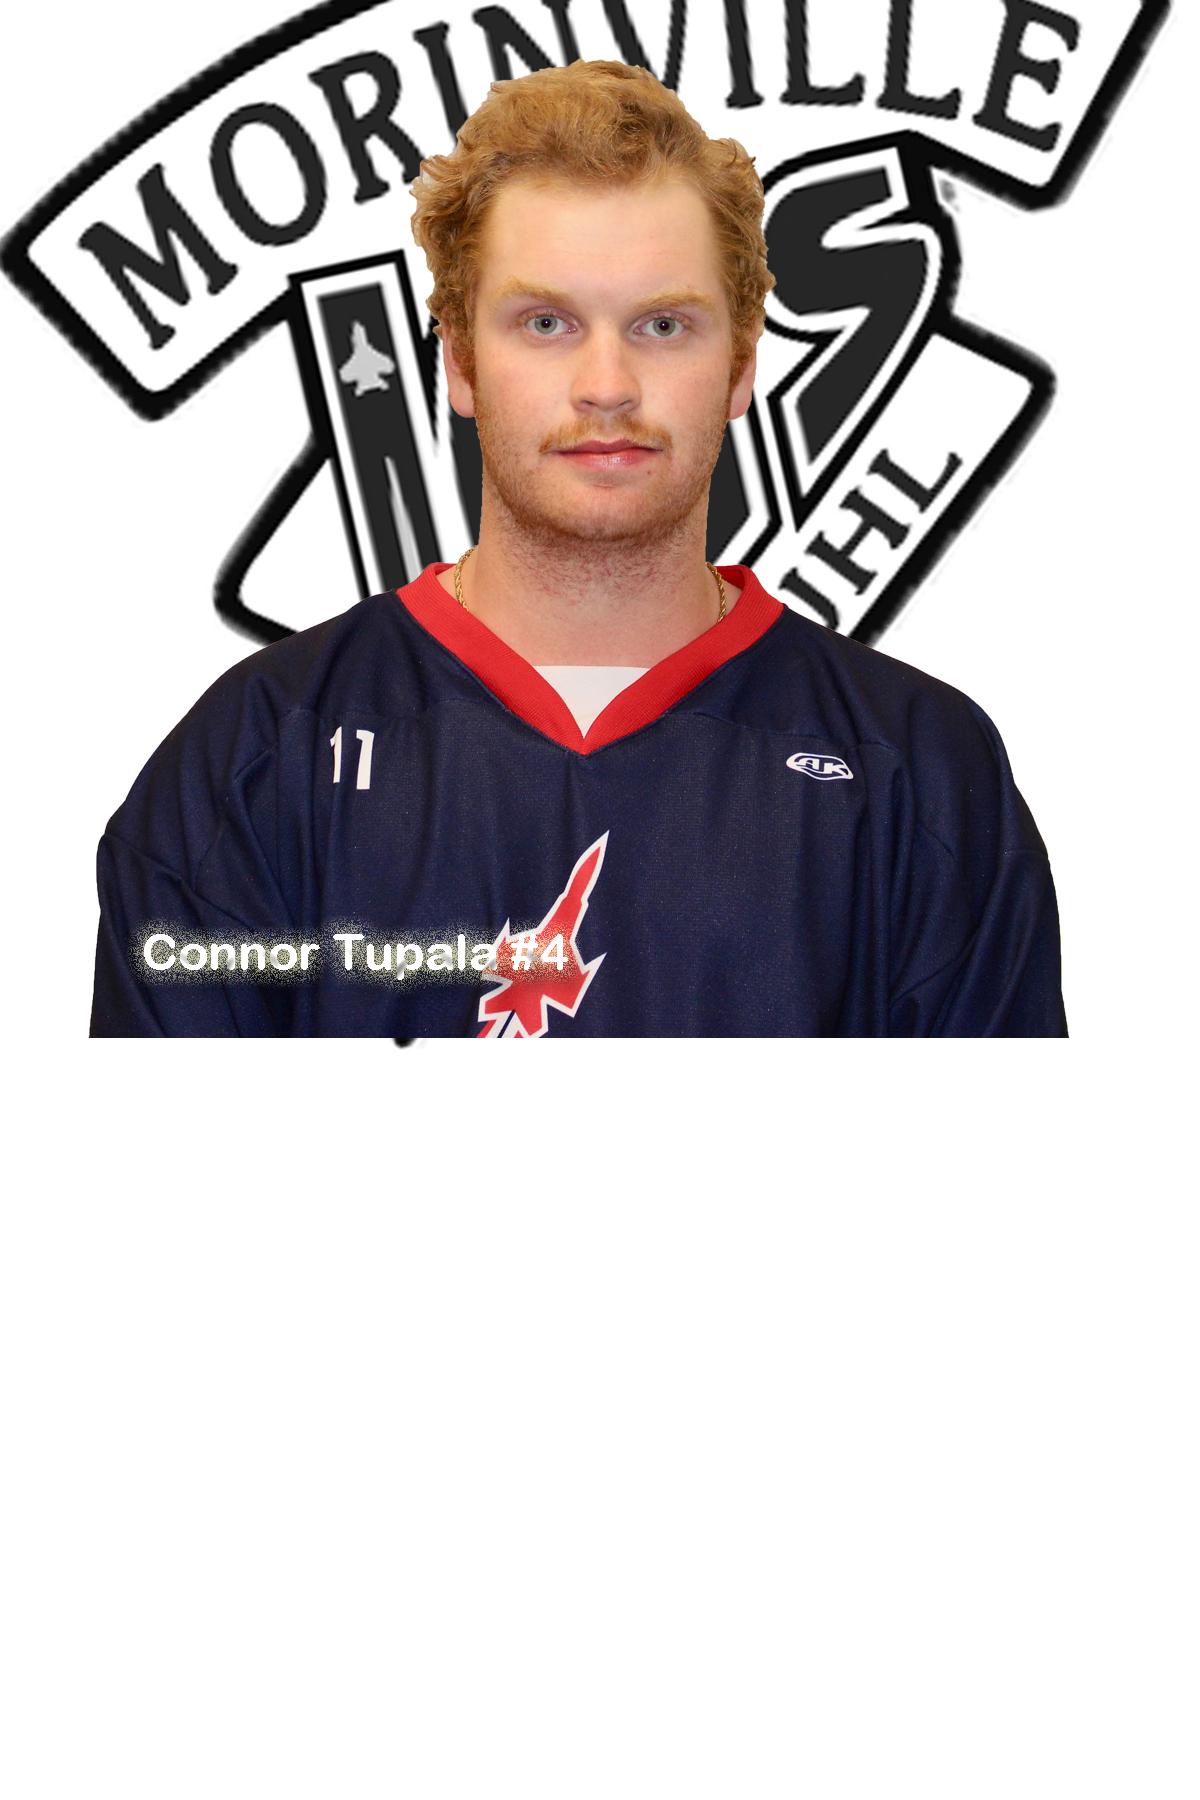 #4 Connor Tupala